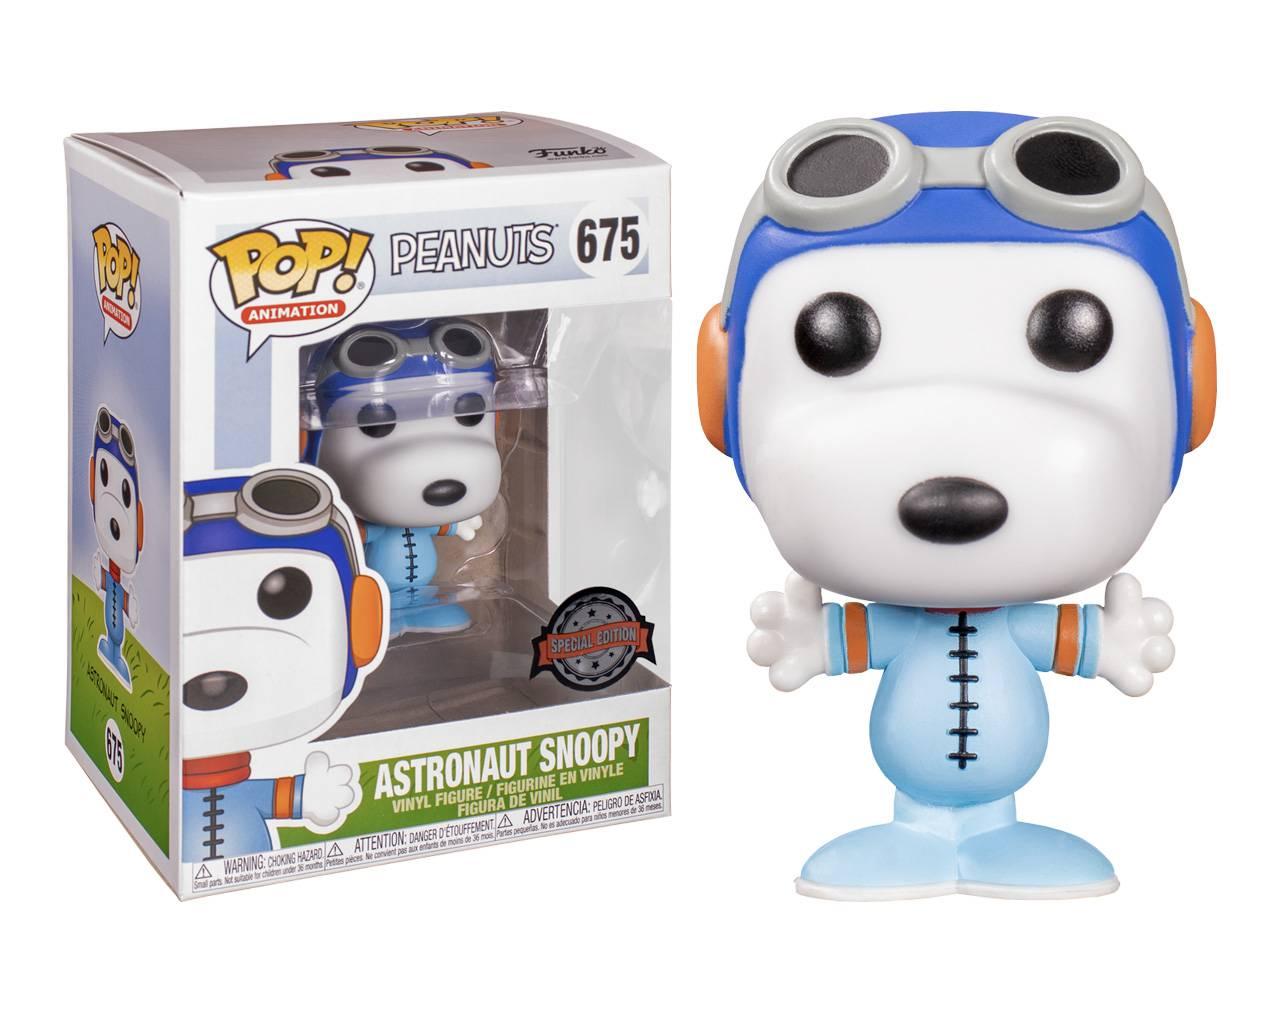 Astronaut Snoopy Pop! Vinyl